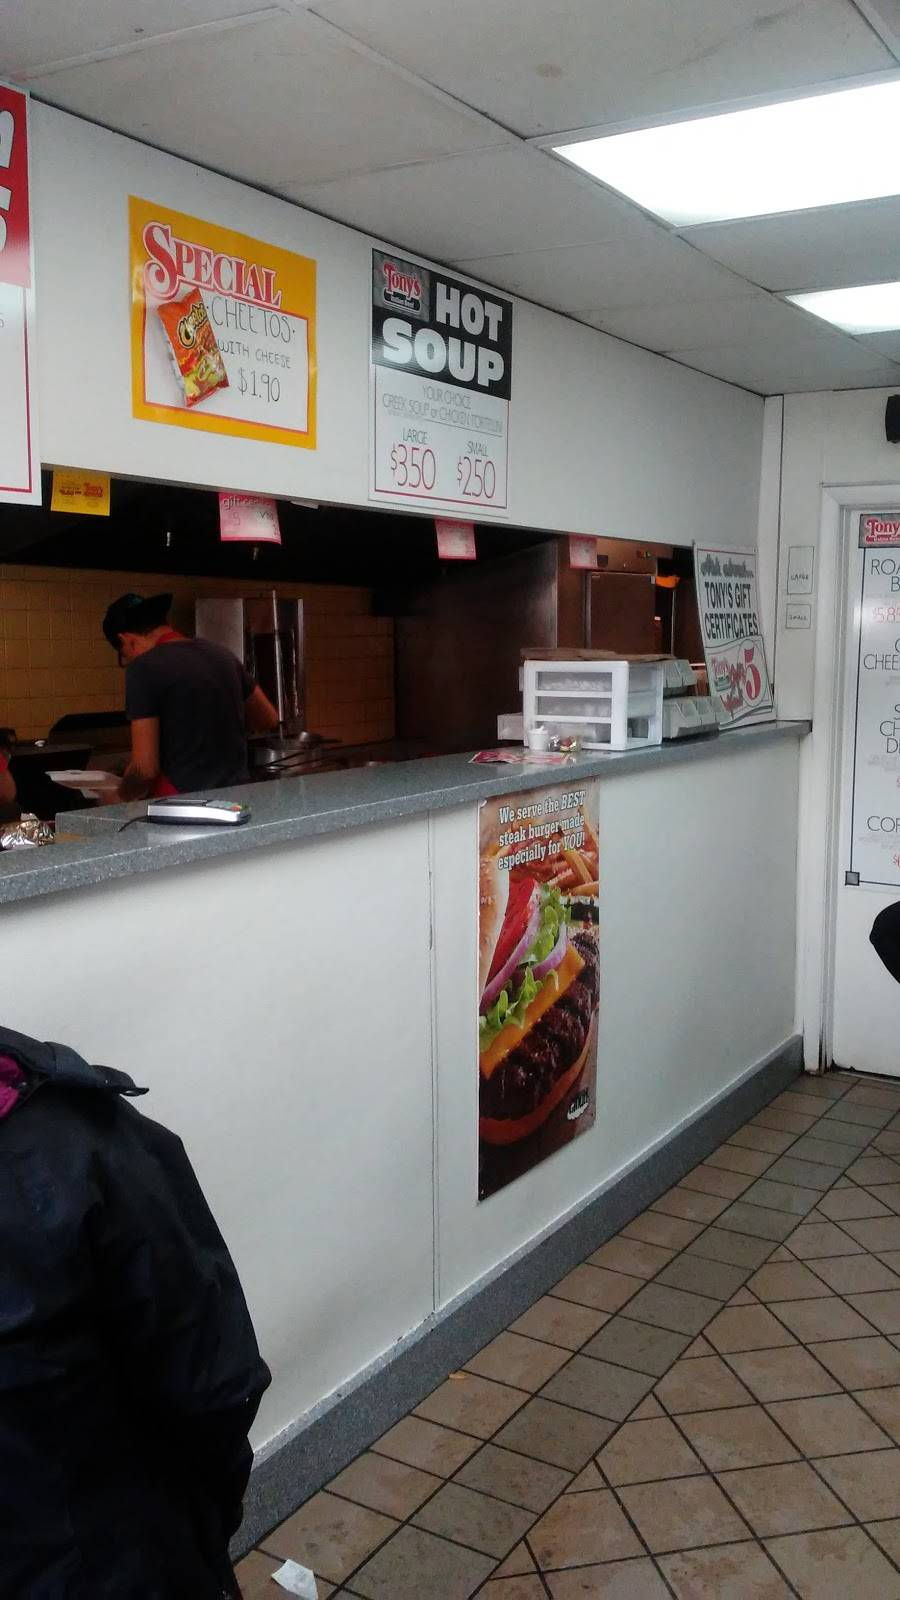 Tonys Italian Beef   restaurant   7007 S Pulaski Rd, Chicago, IL 60629, USA   7732846787 OR +1 773-284-6787